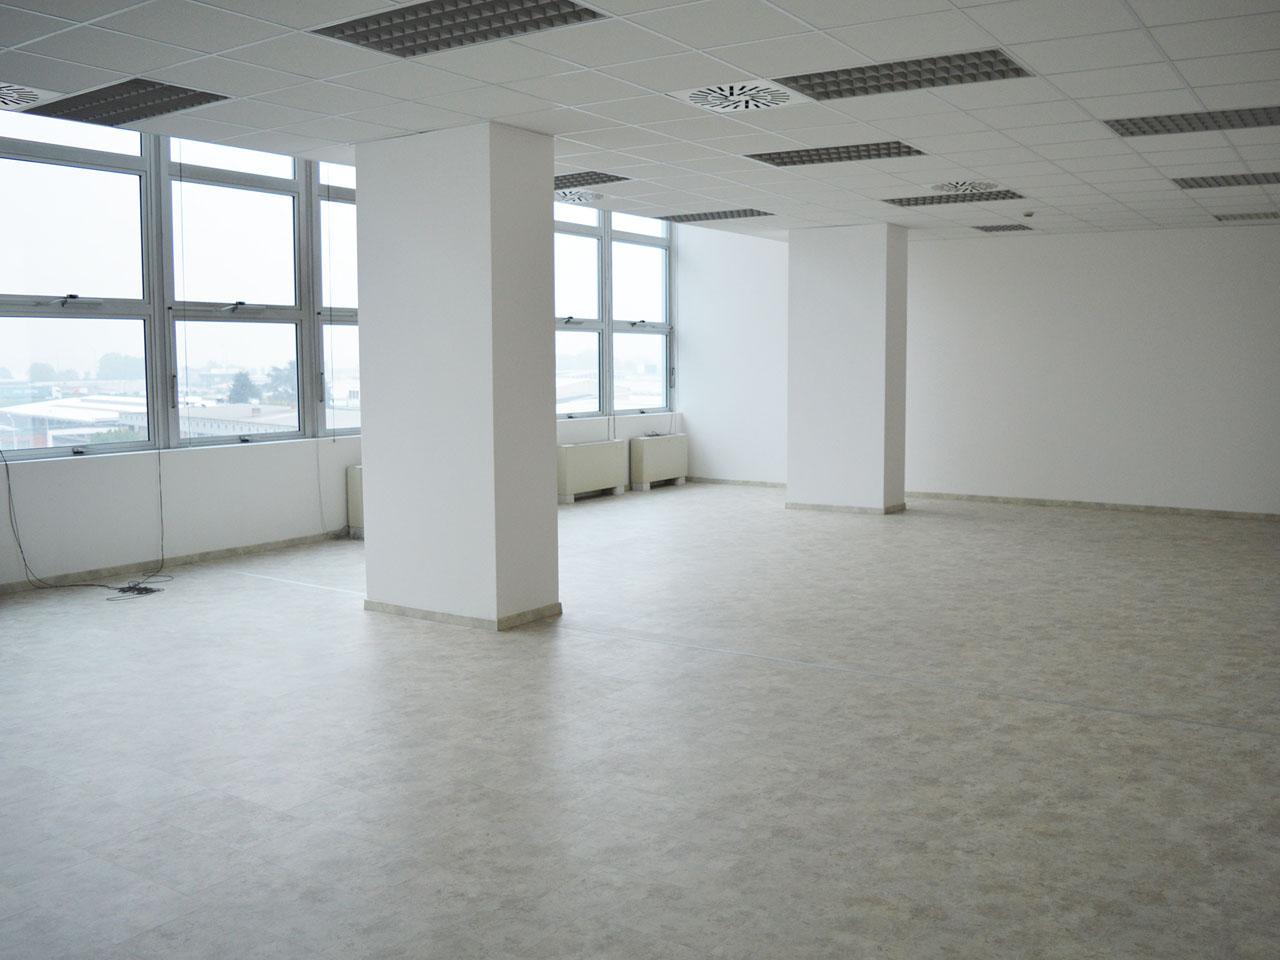 Office for rent in Milan - 750 mq (8073 sqft) - via Fantoli 7, Mecenate area.